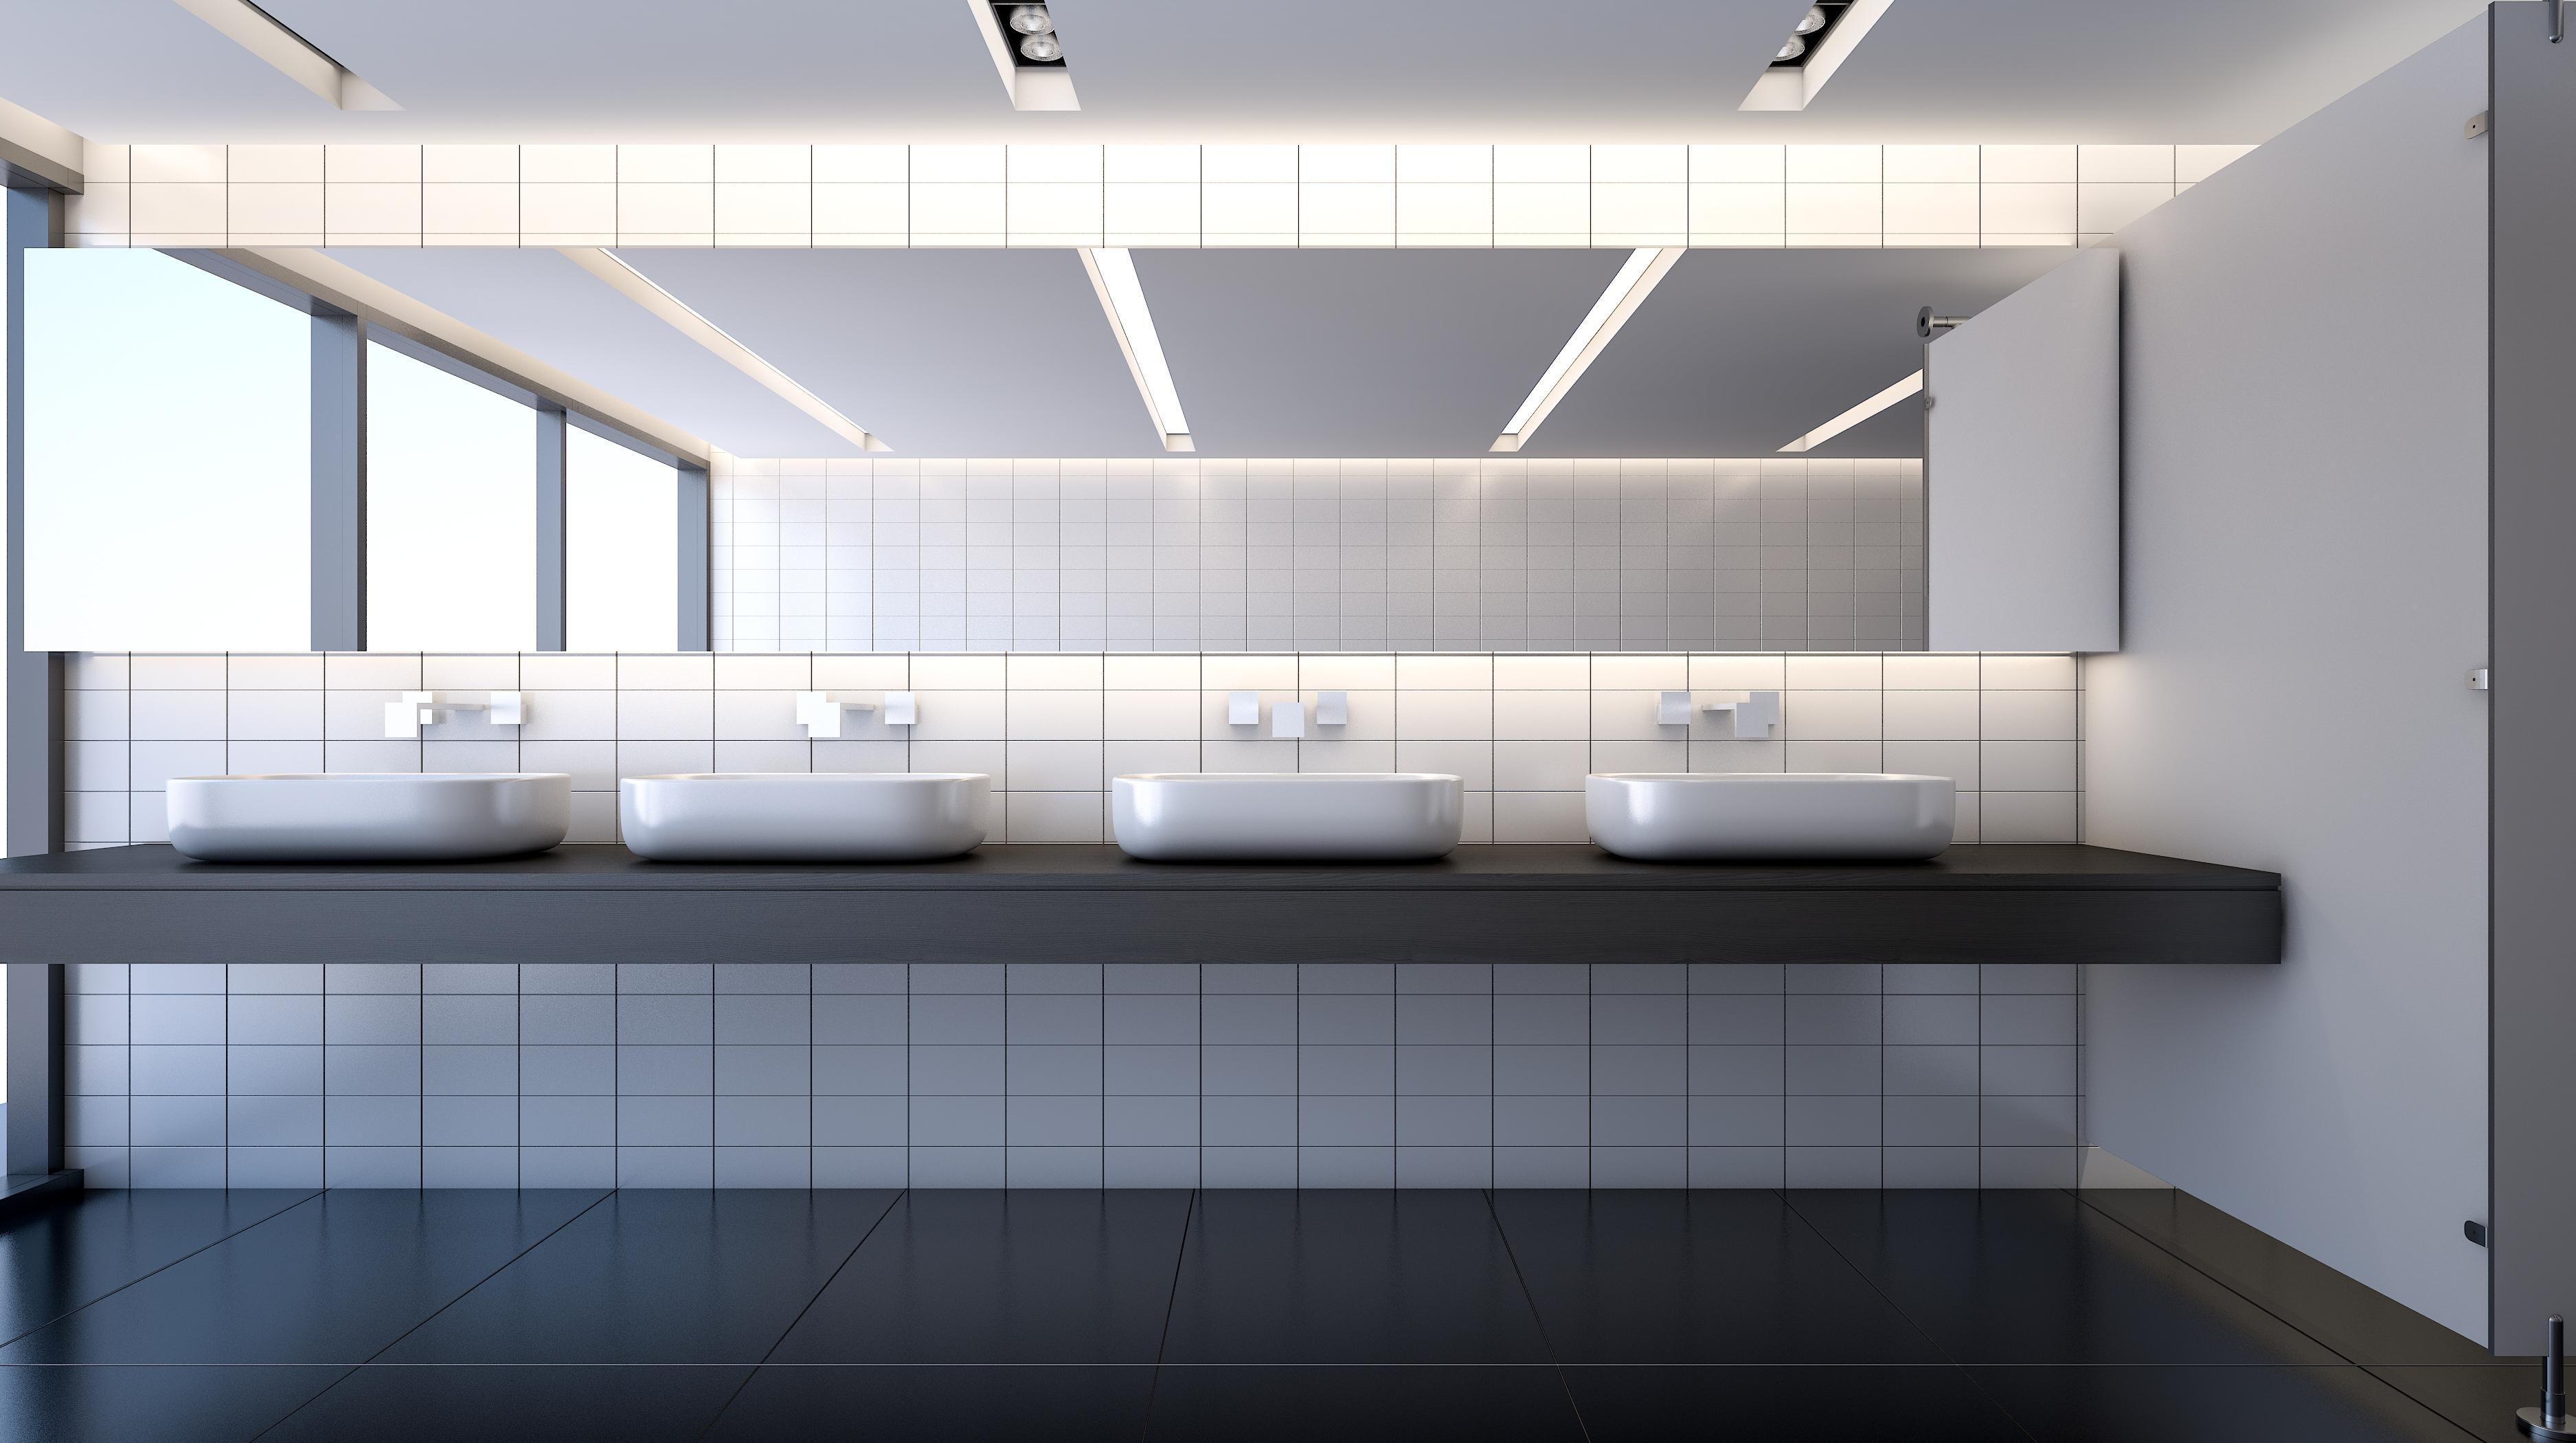 Public modern restroom , 3d rendering